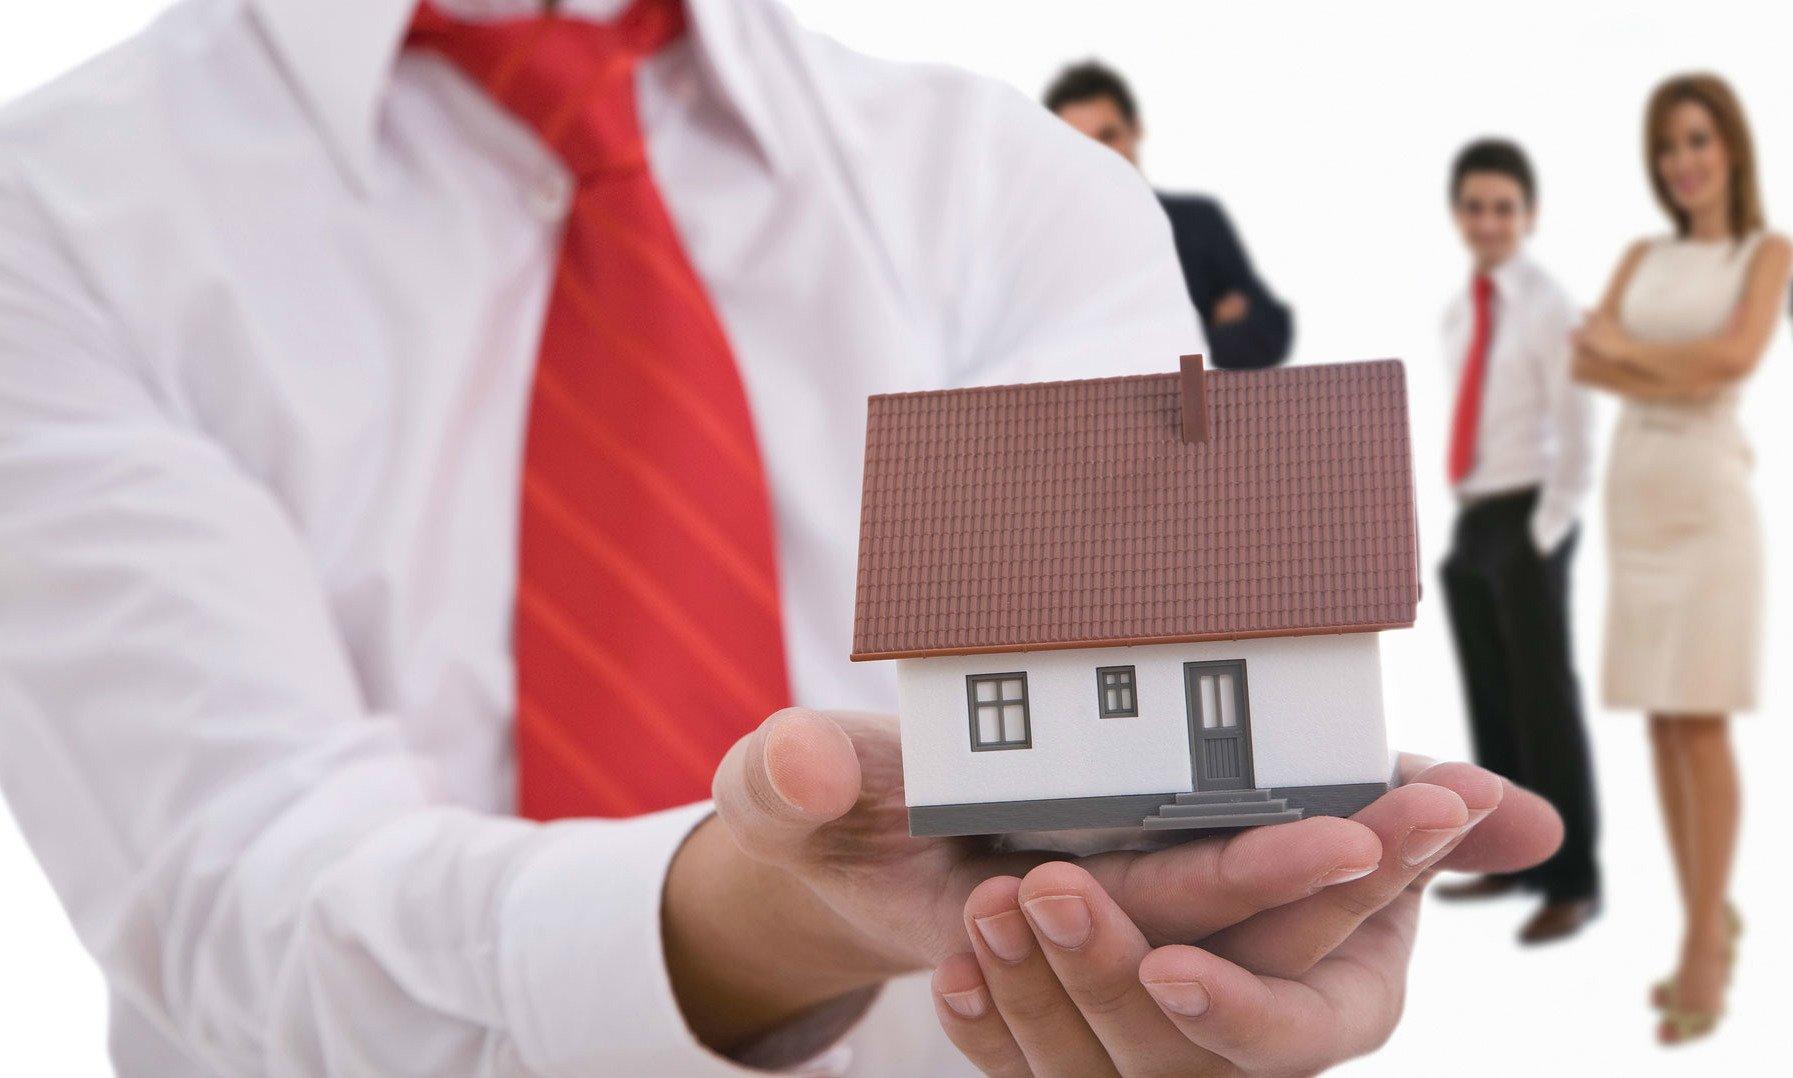 Расприватизация квартиры через суд закон